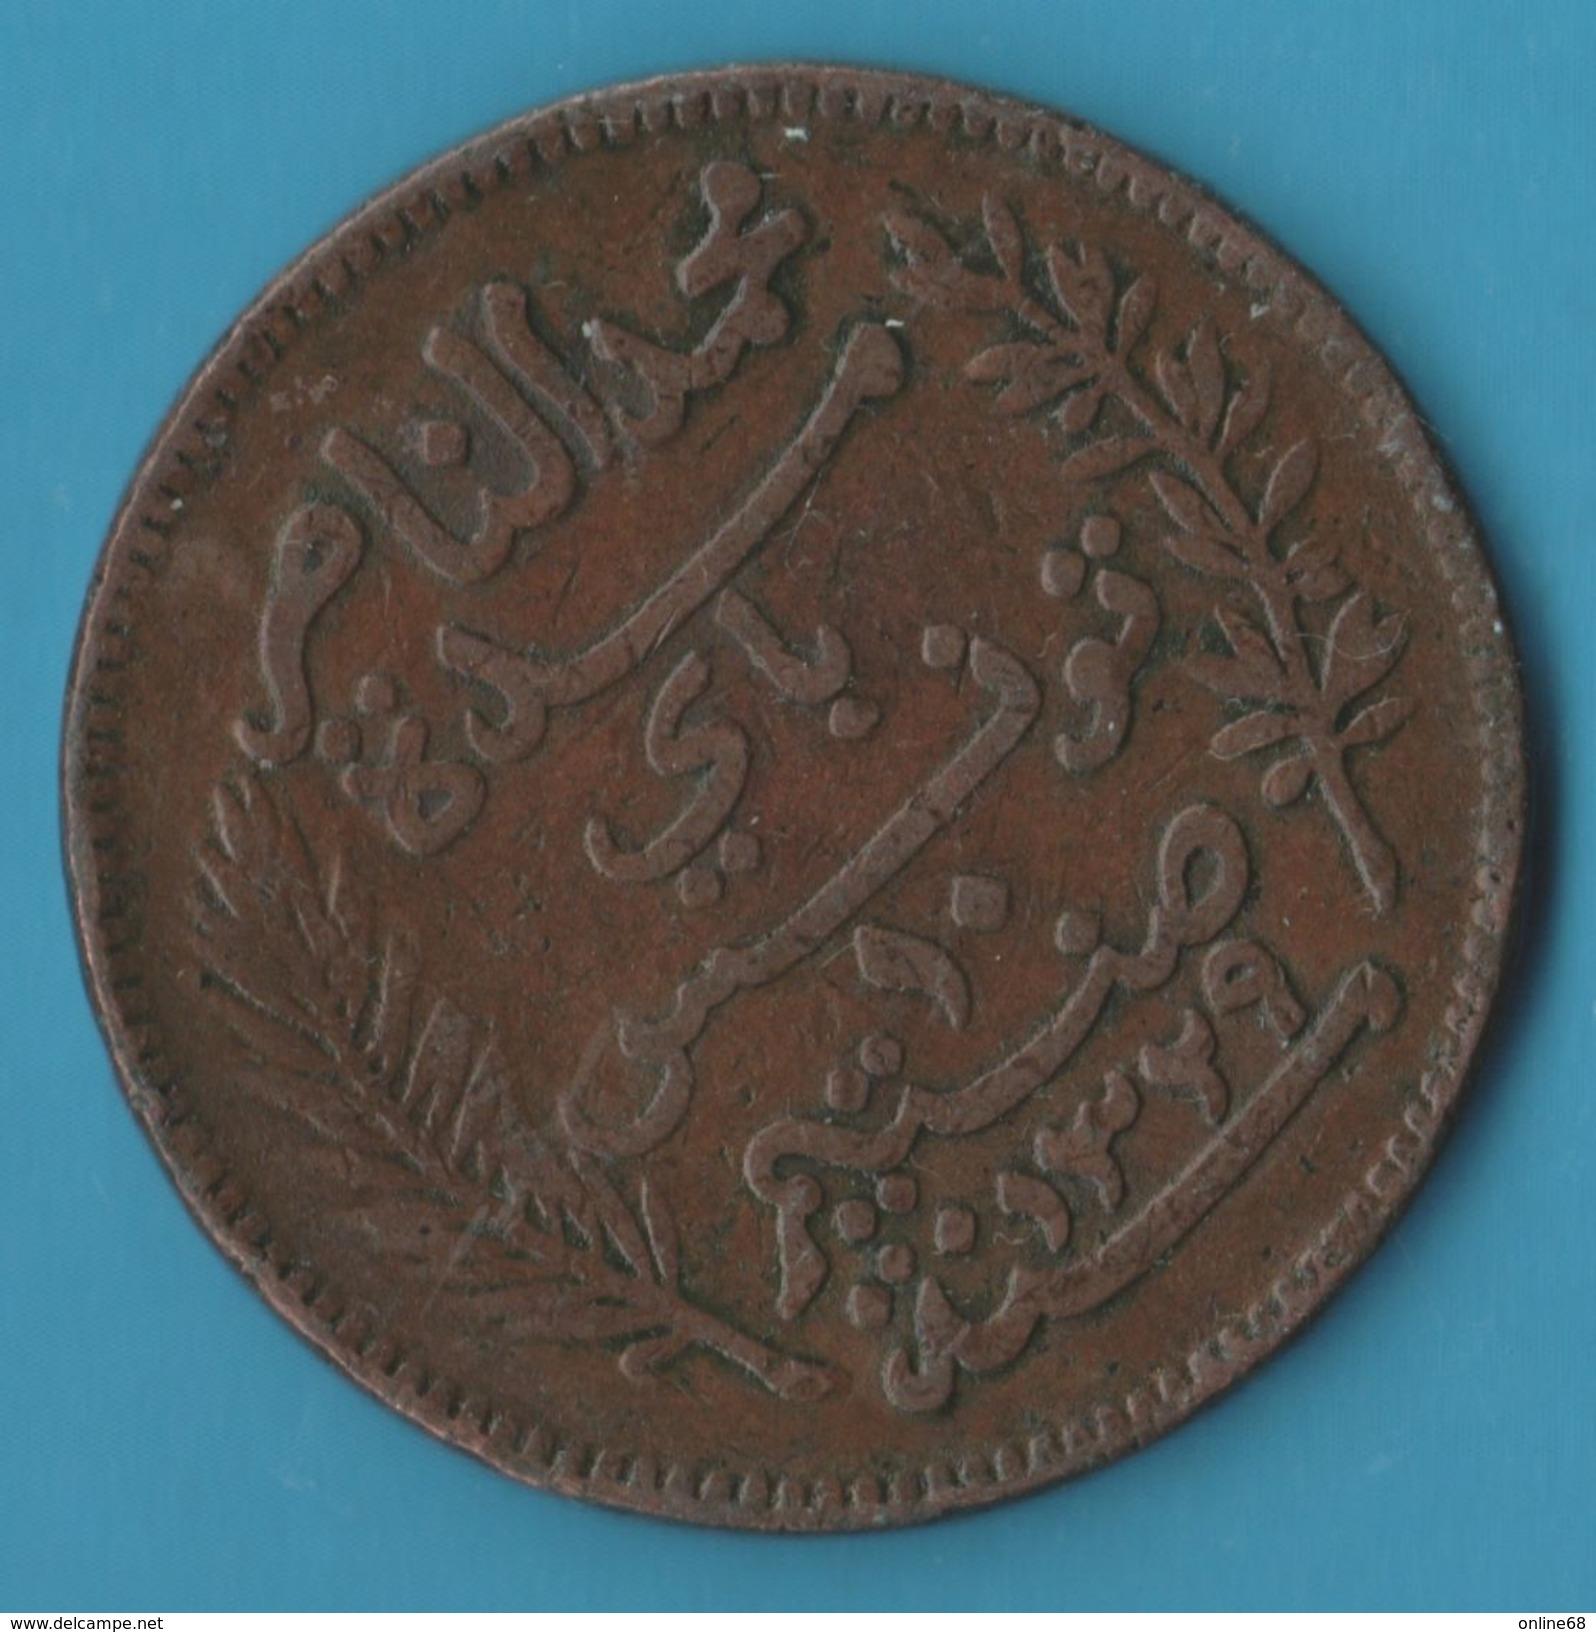 TUNISIE 10 Centimes 1329 (1911) A Muhammad Al-Nasir Protectorat Français - Tunisia